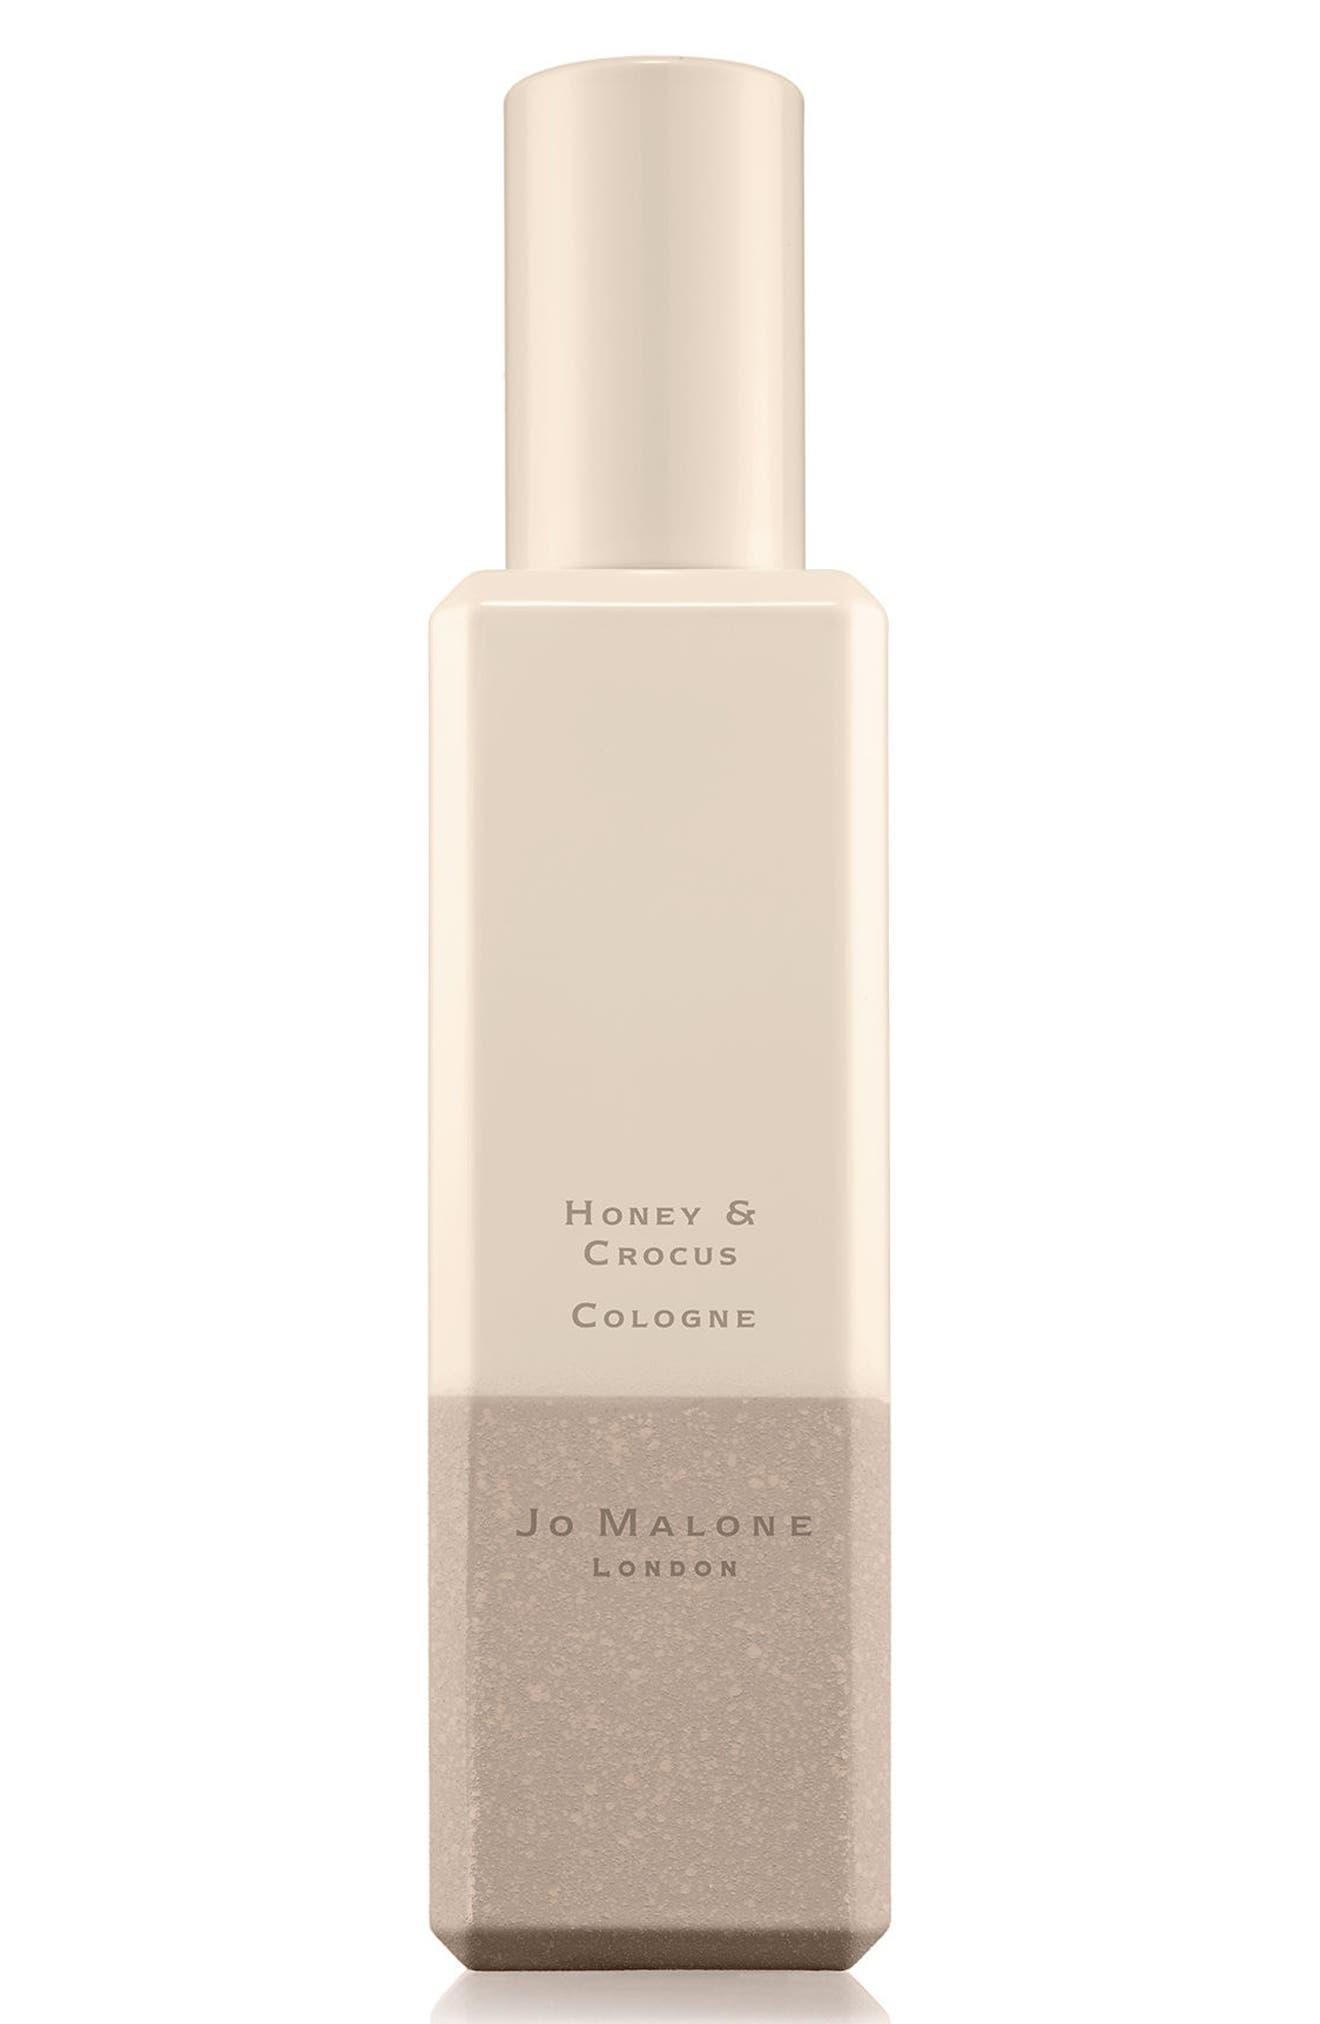 Jo Malone London™ Honey & Crocus Cologne (Limited Edition)